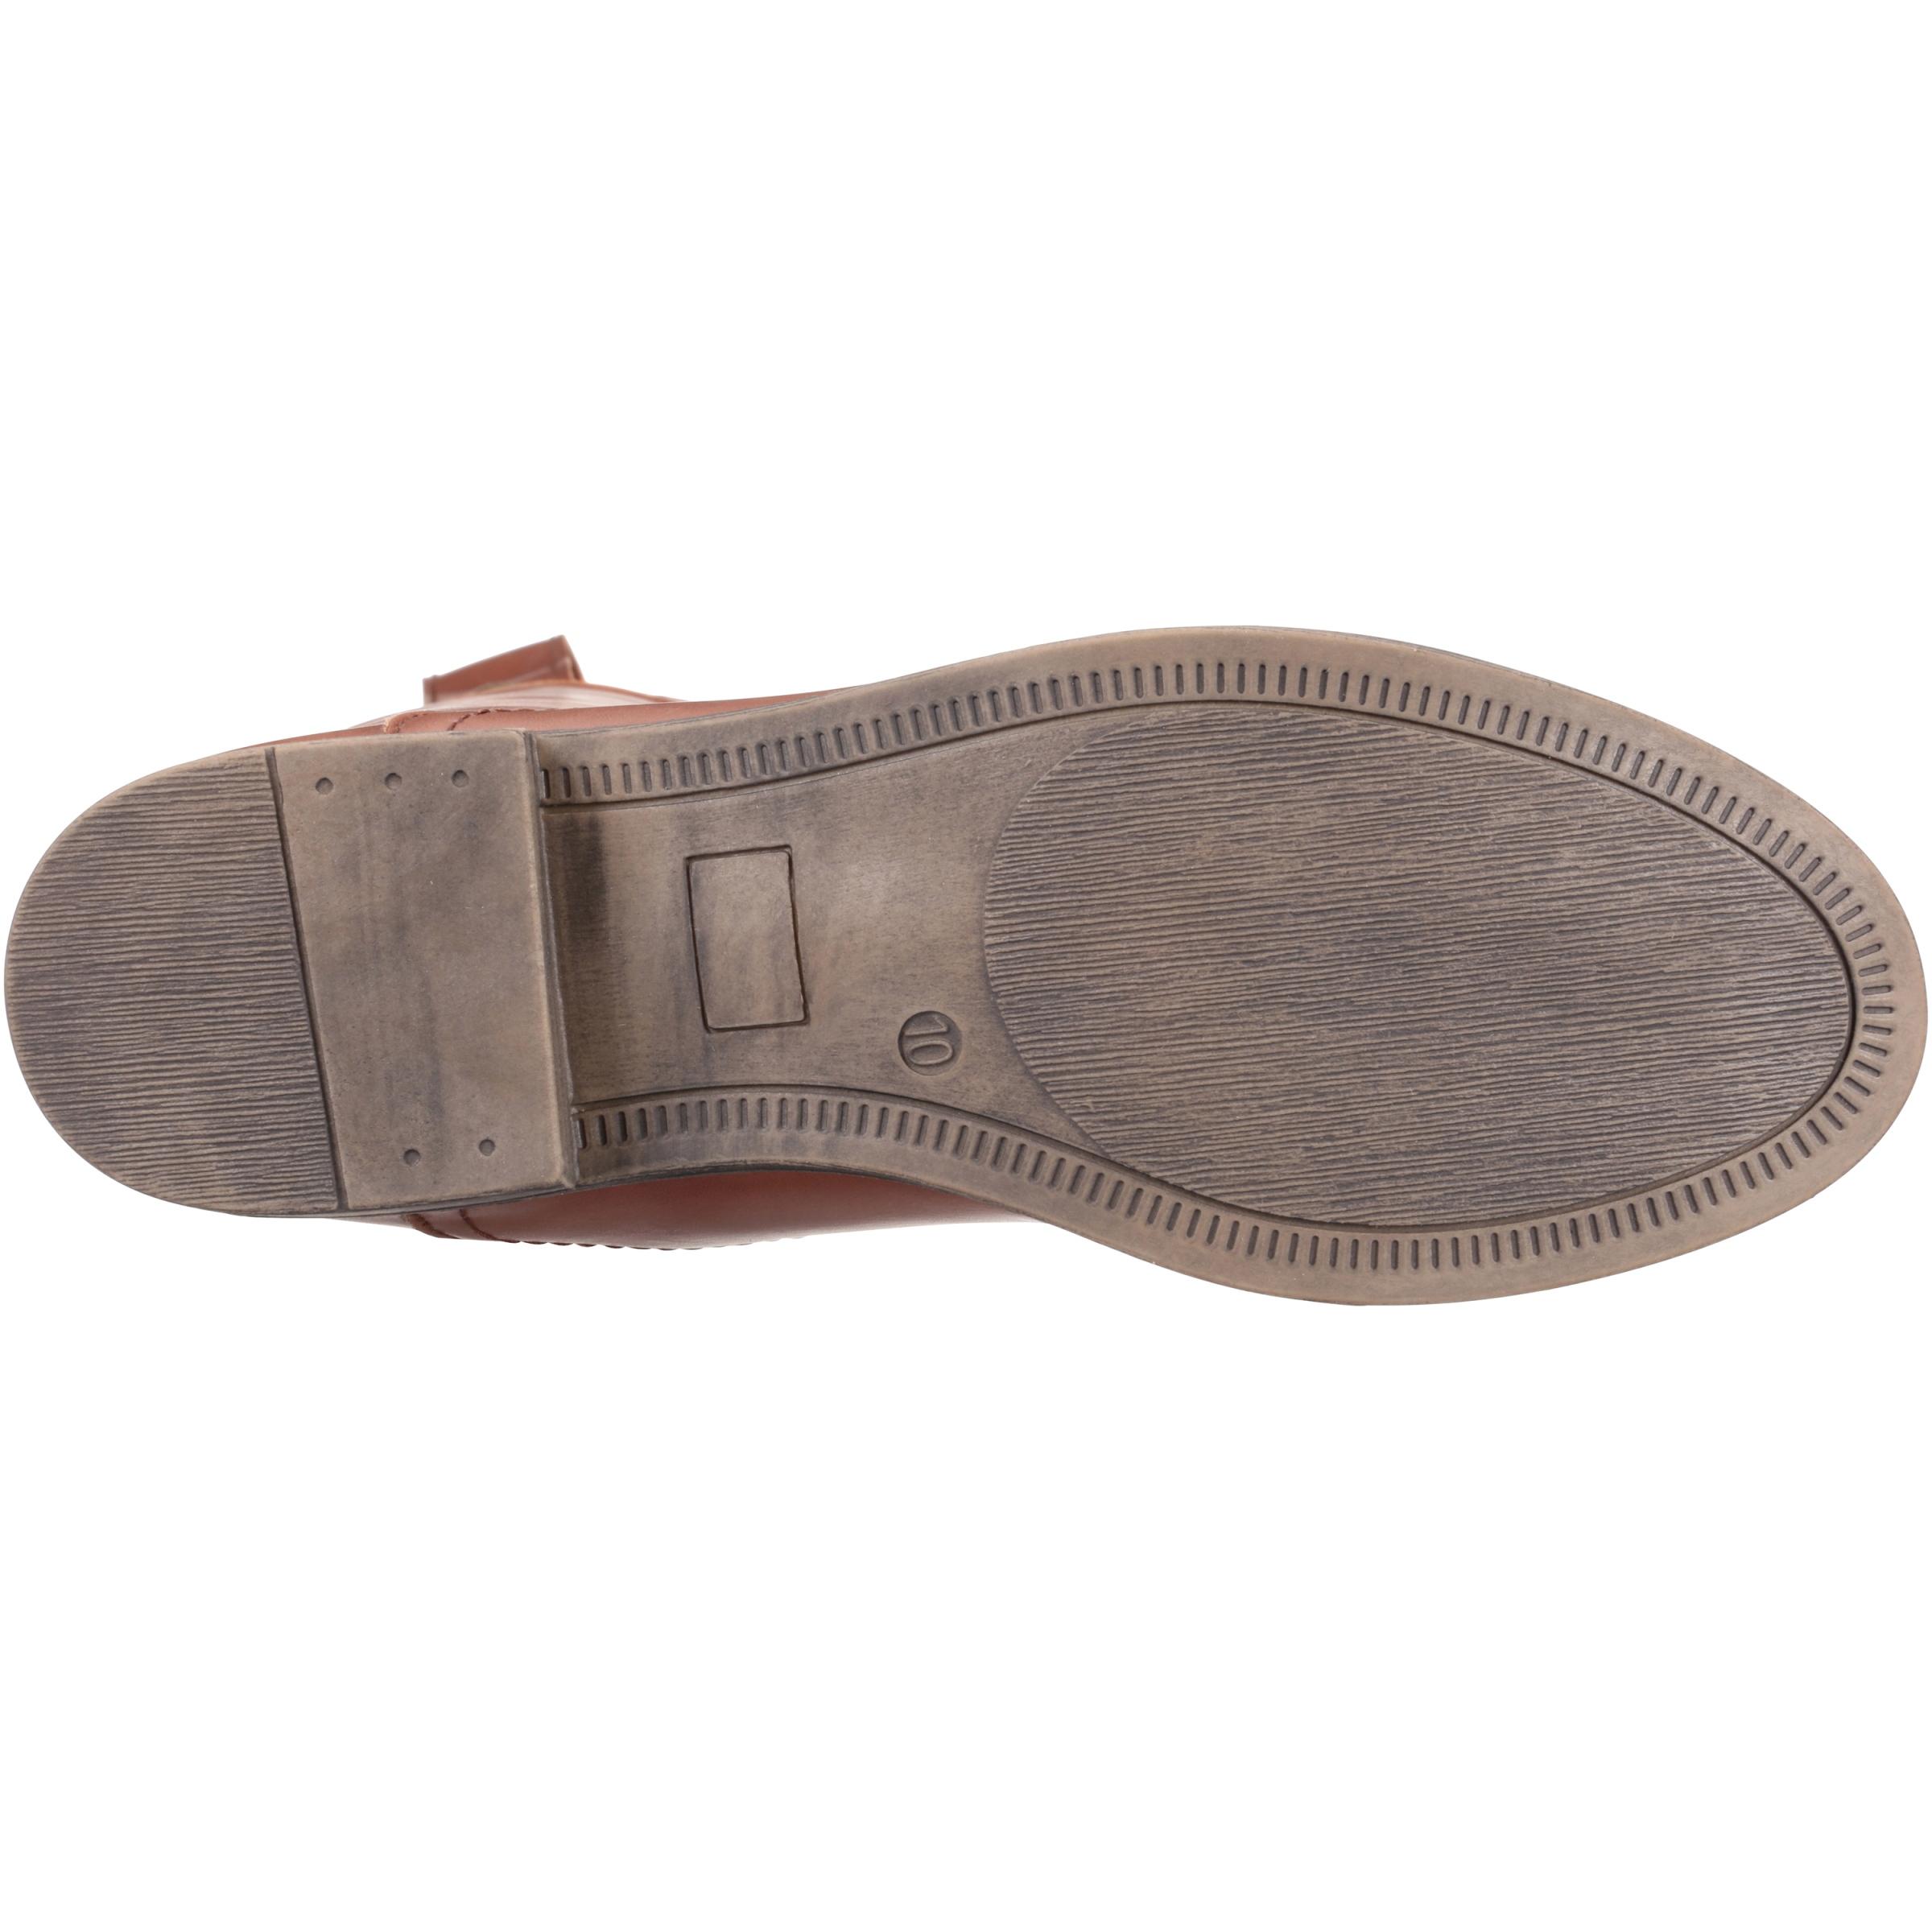 MoMo Women's Alani Boot Shoe Size: 6